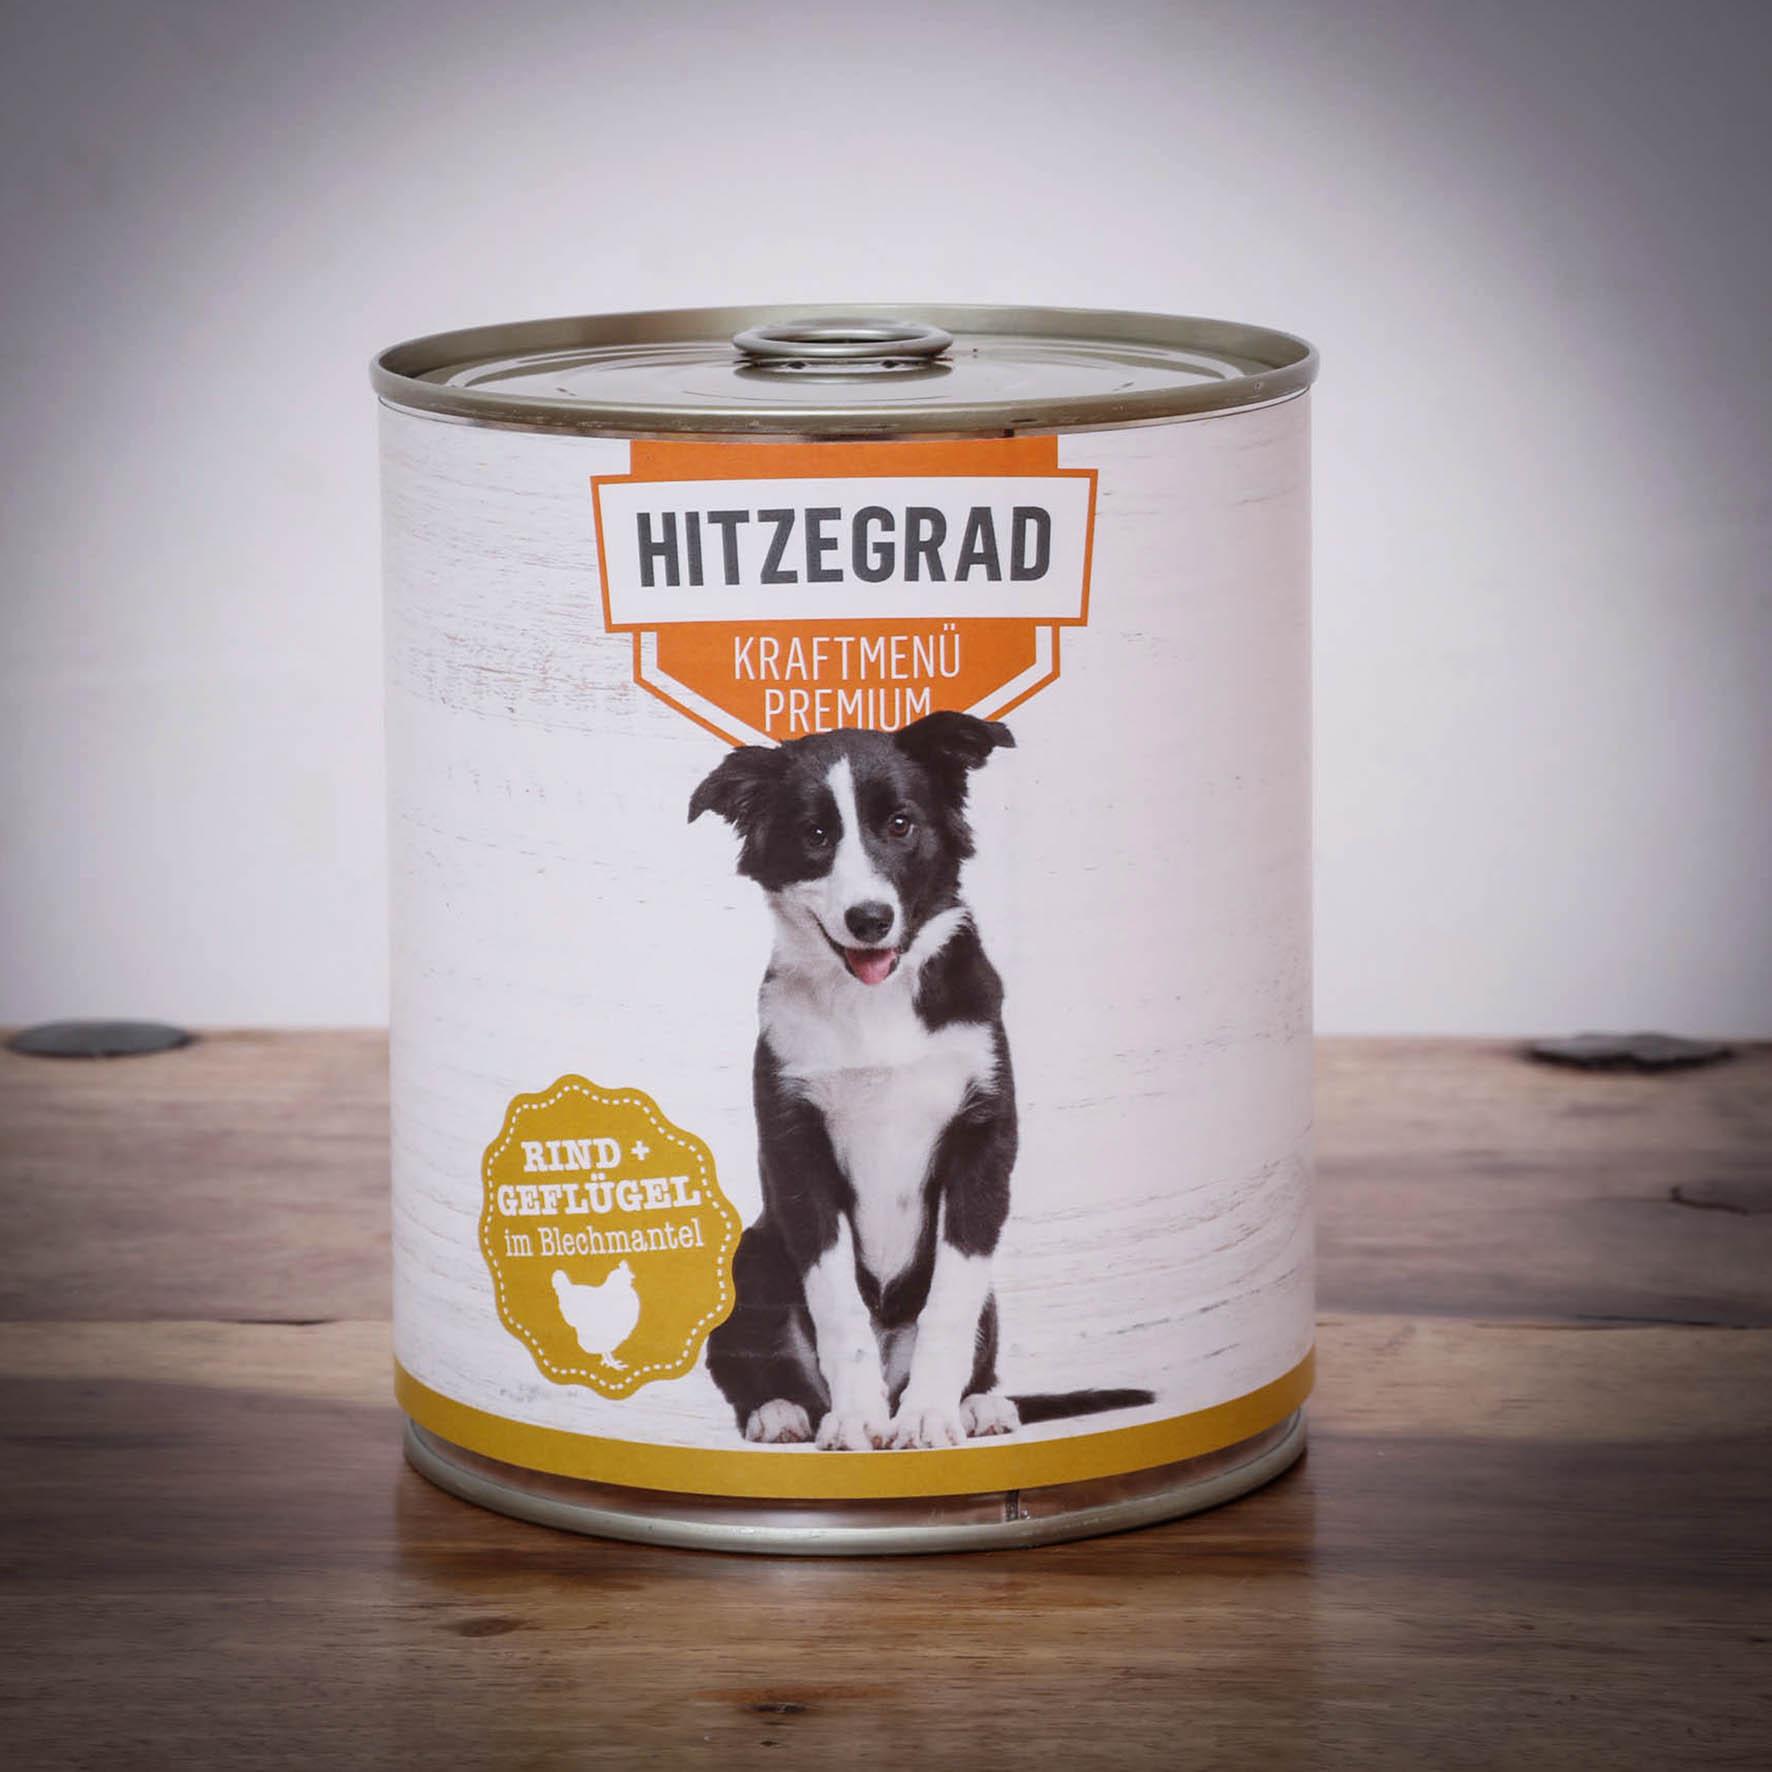 Hitzegrad - Kraftmenü, 800g für Hunde